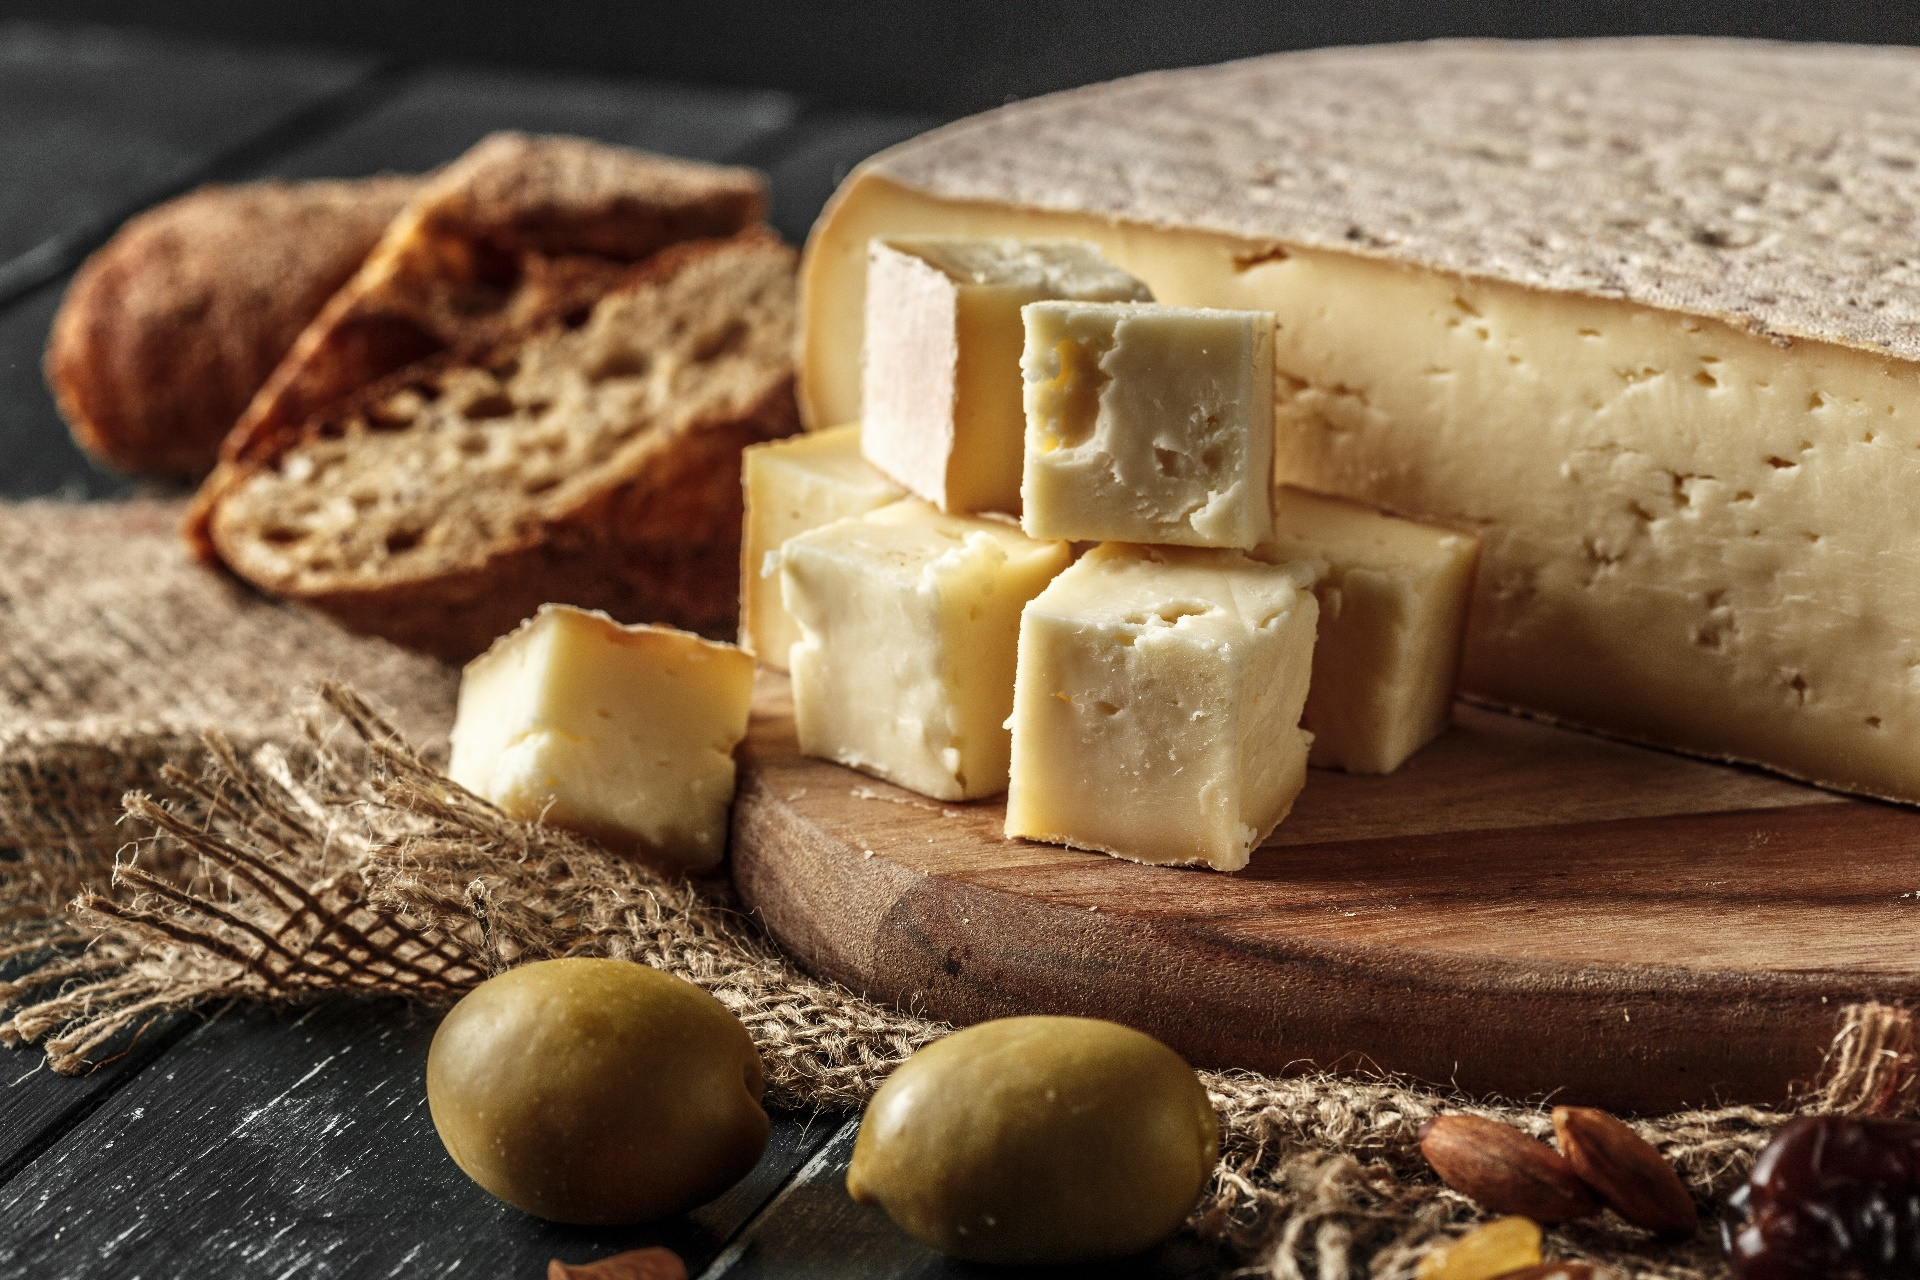 General 1920x1280 food cheese bread cutting board